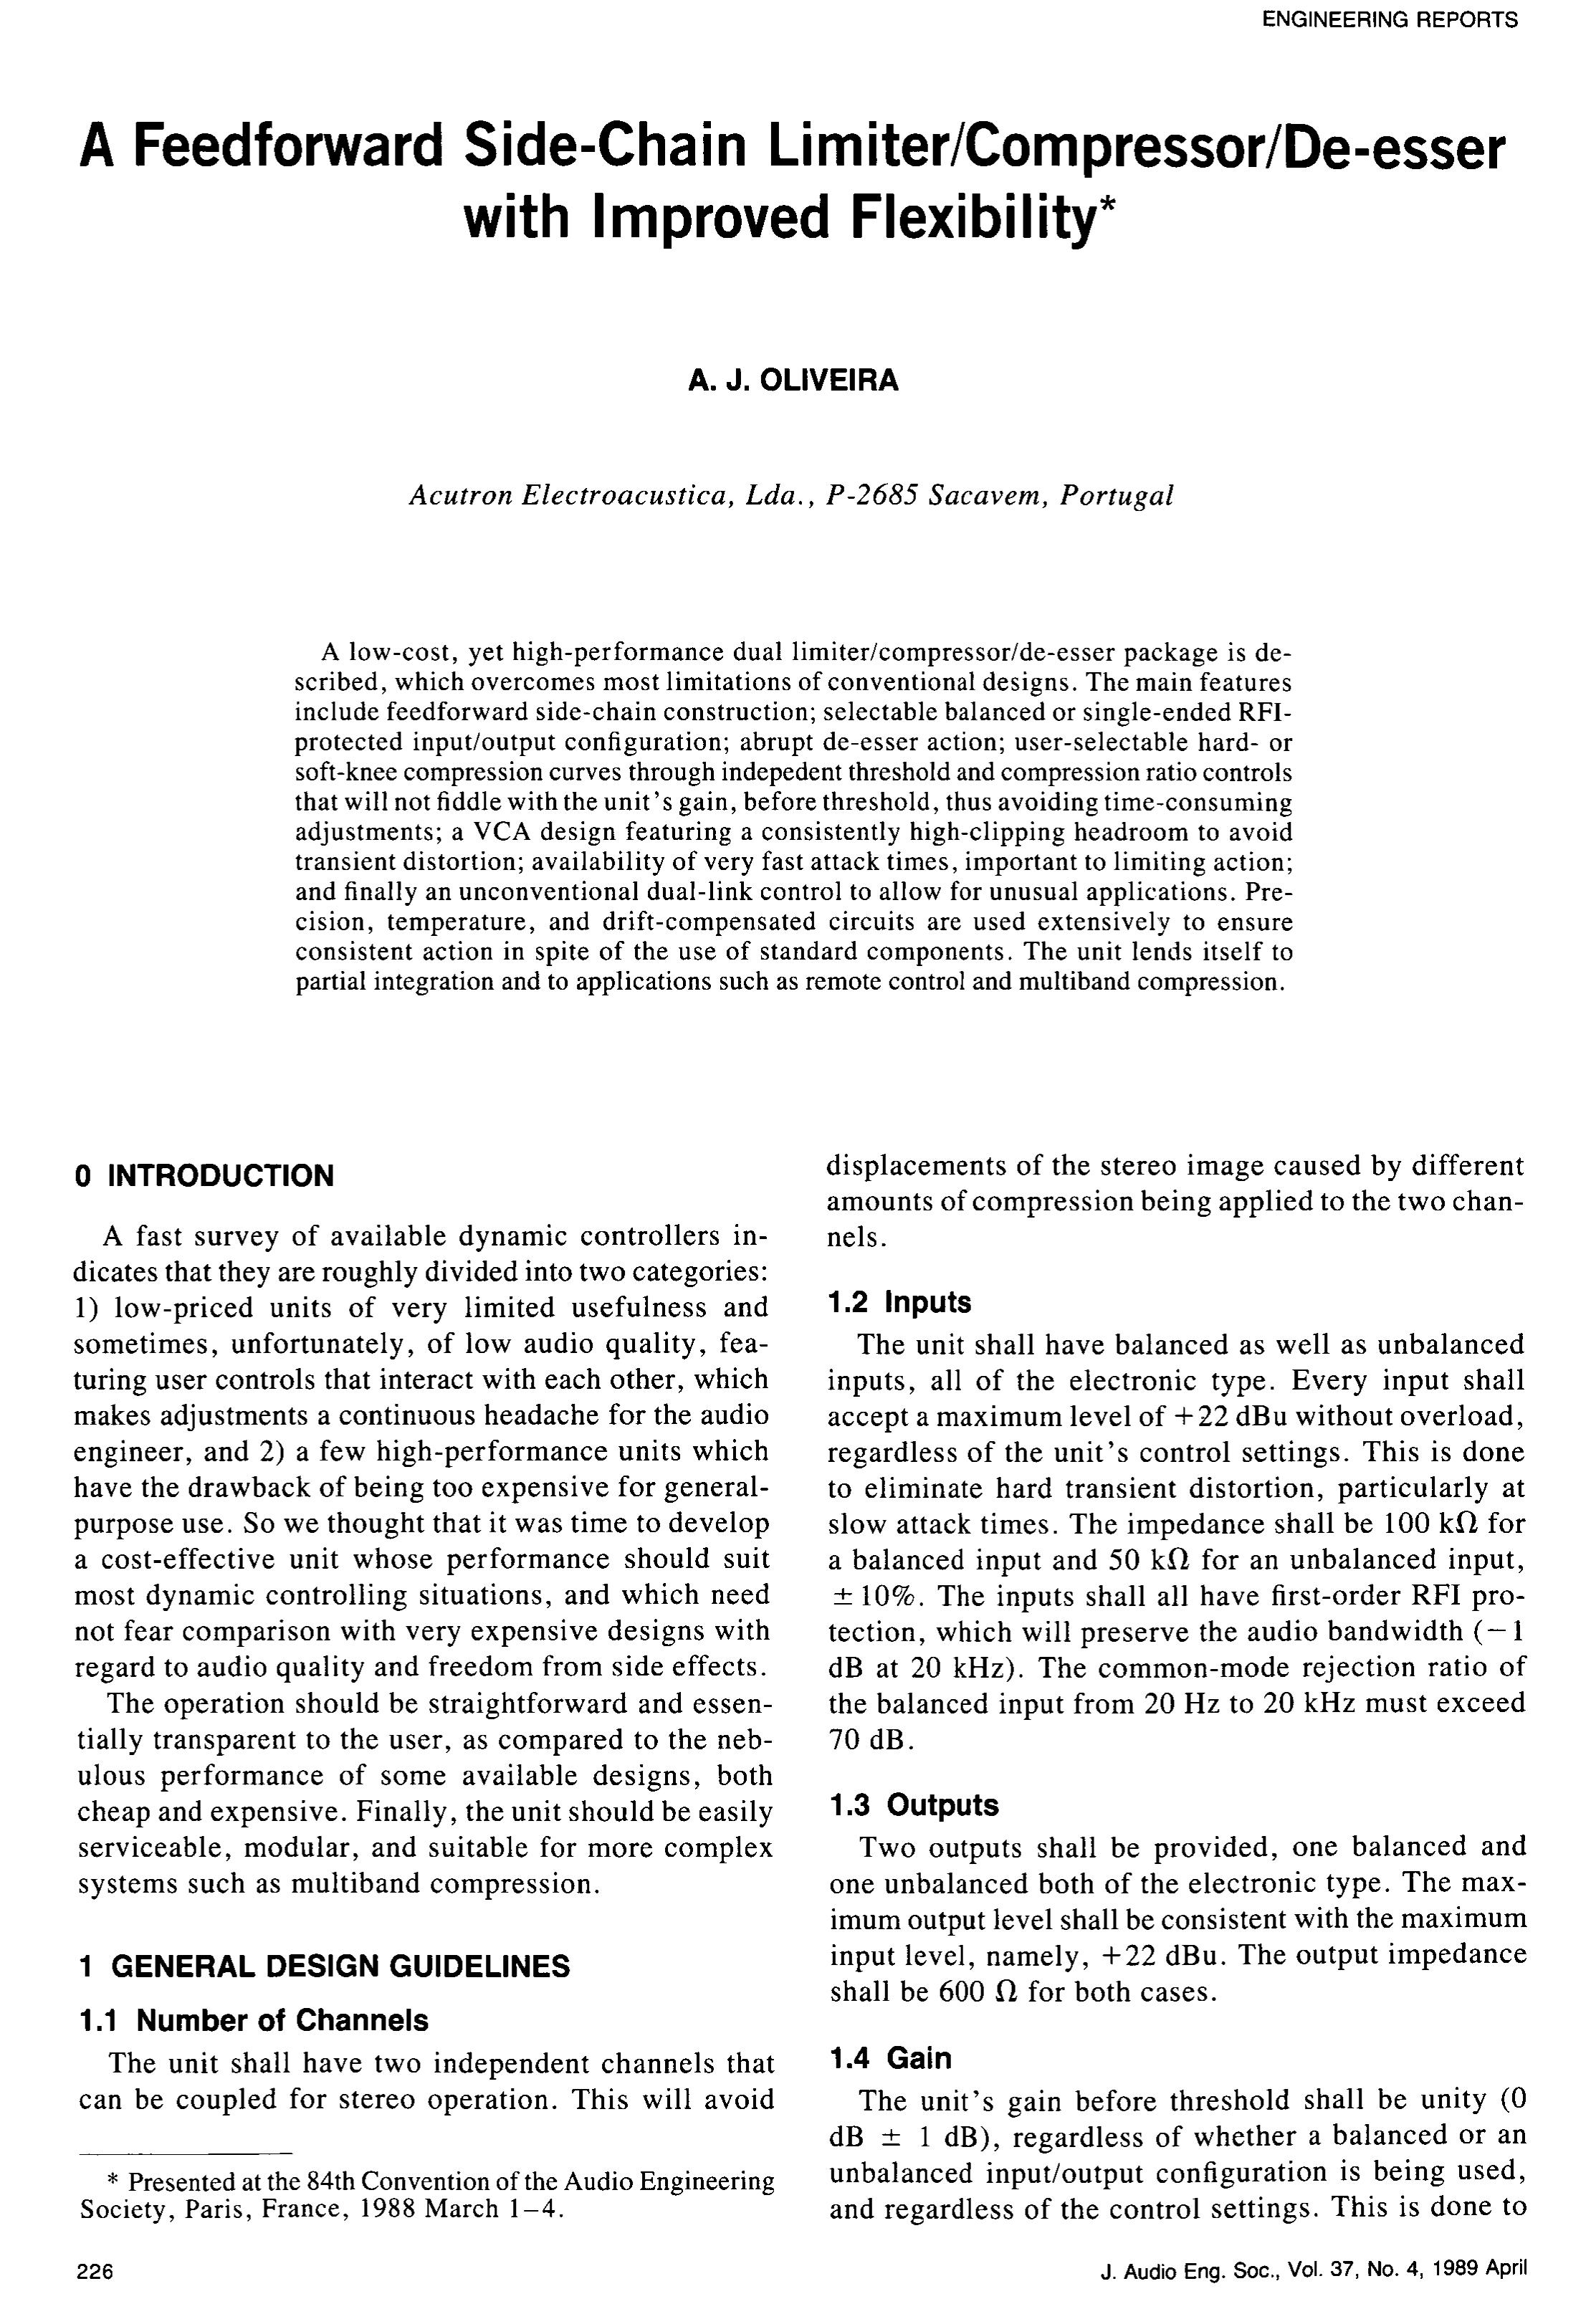 AES E-Library » A Feedforward Side-Chain Limiter/Compressor/De-esser ...